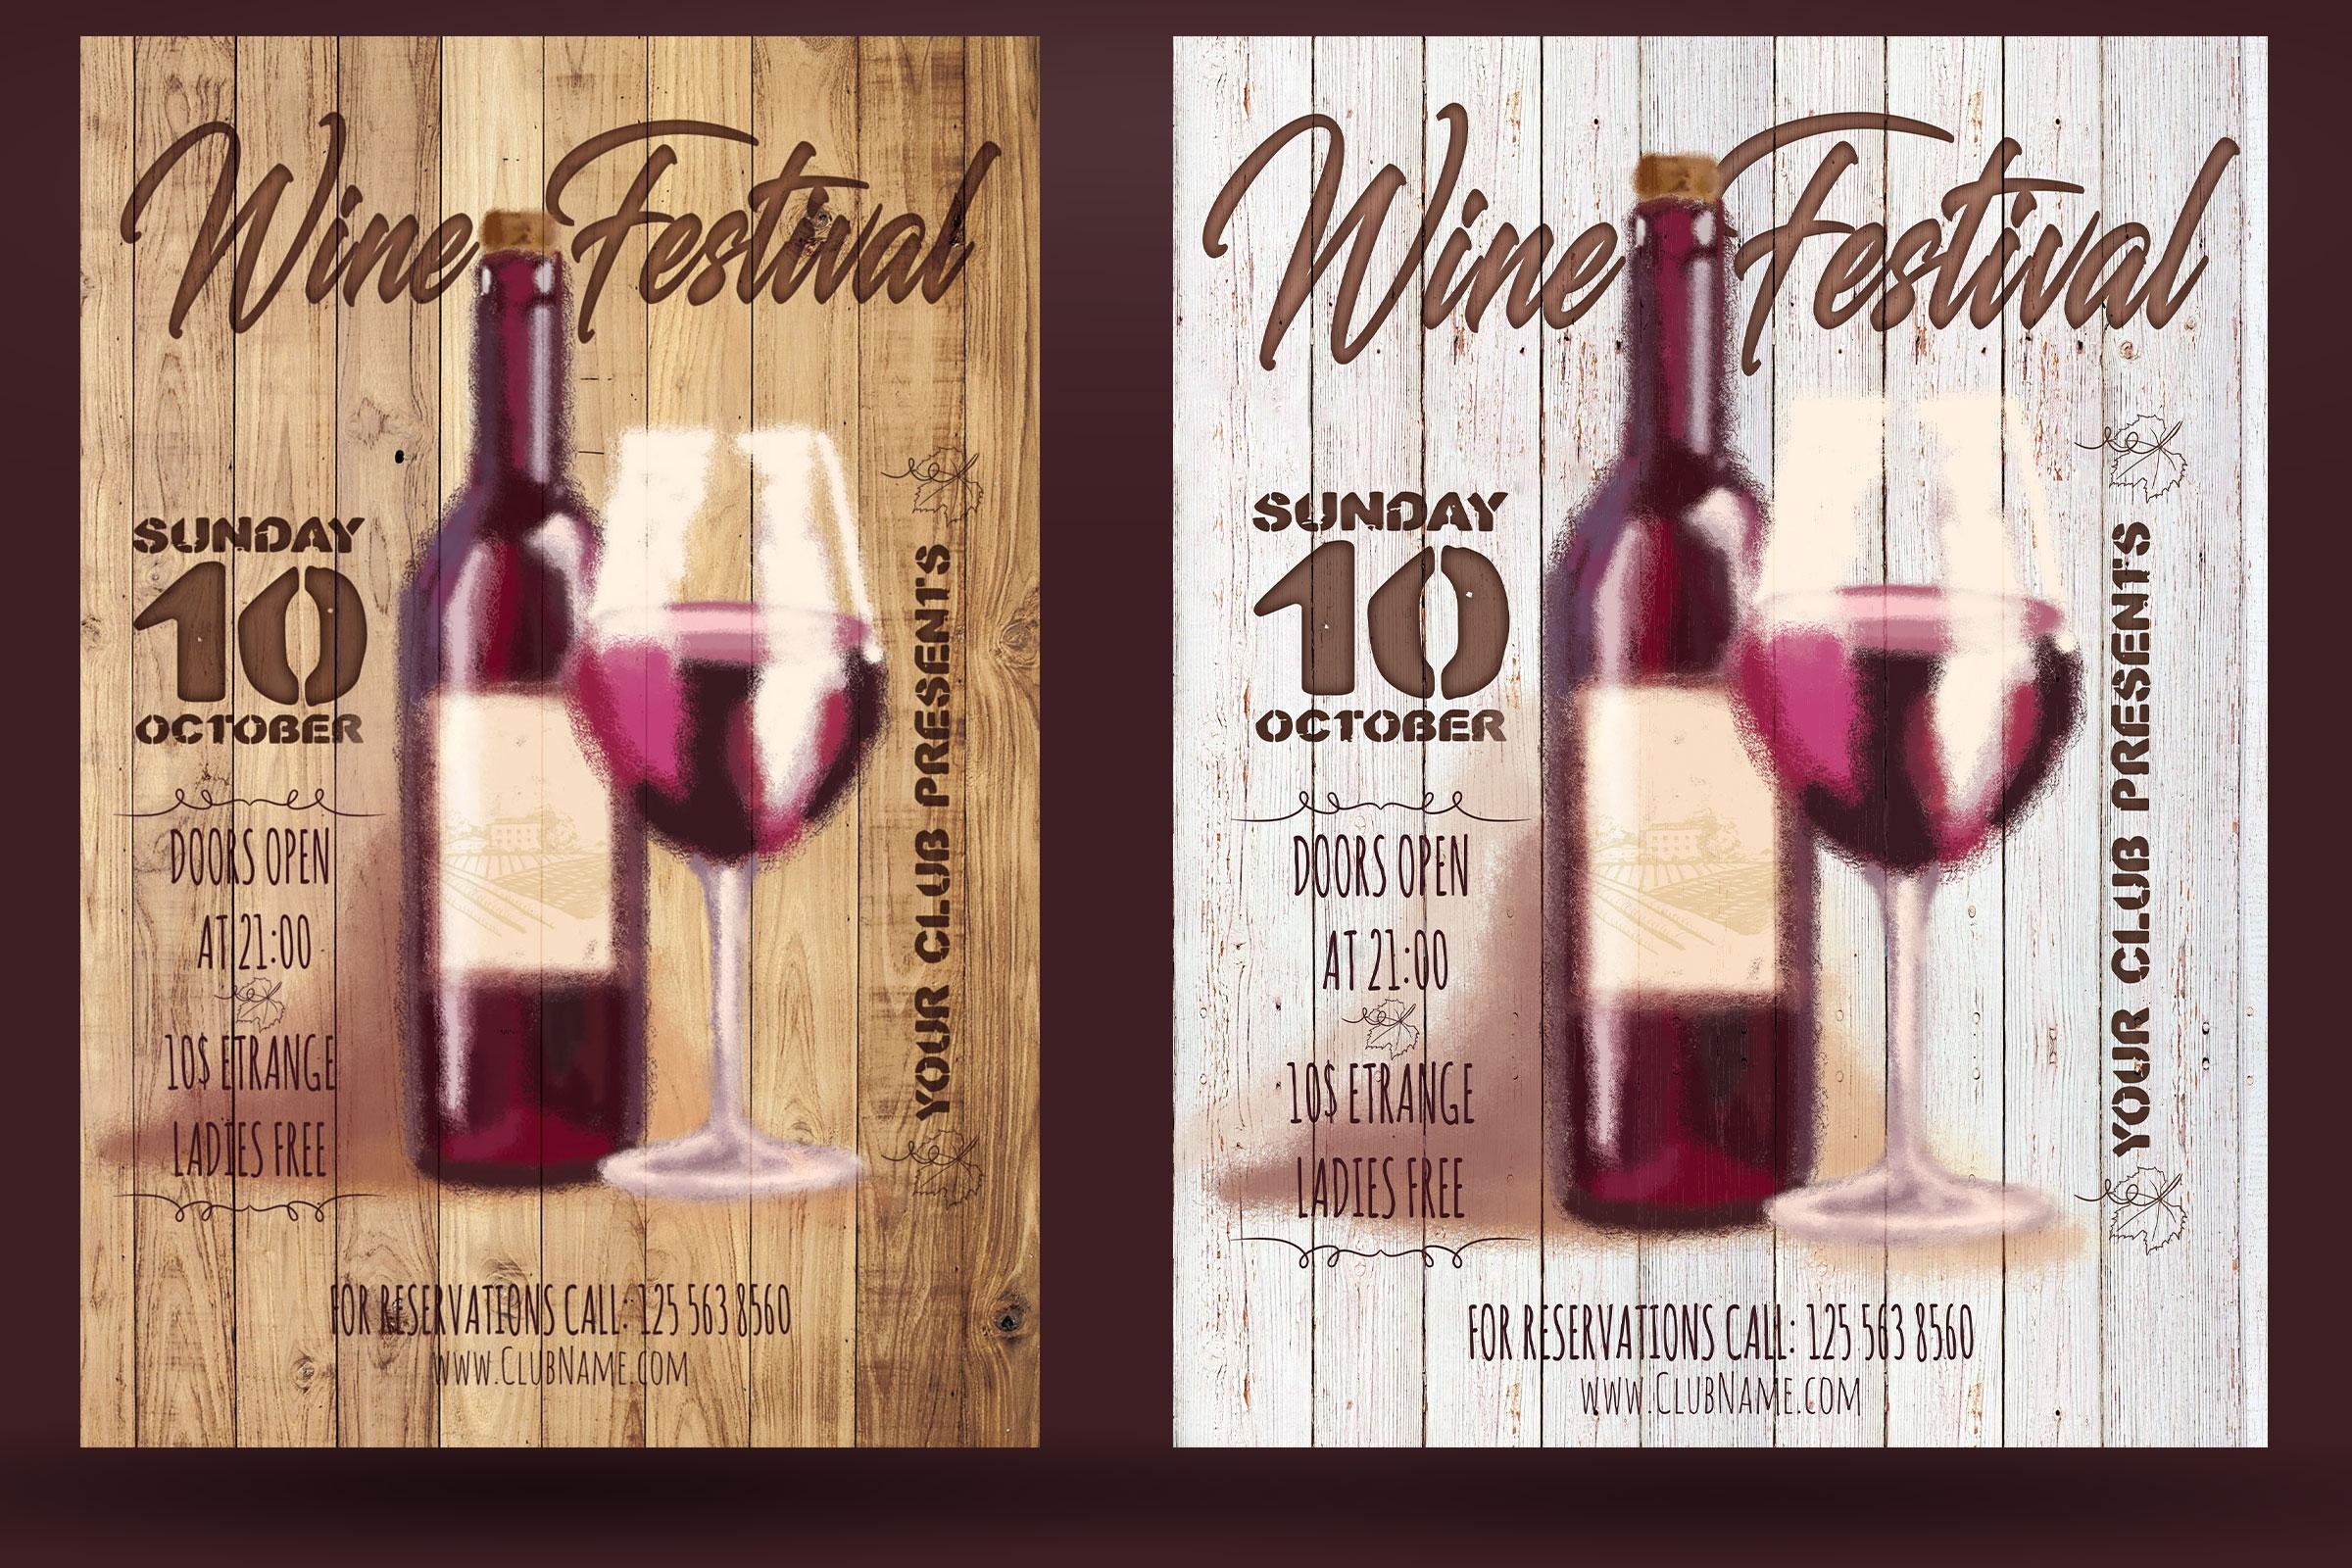 Wine Festival Flyer example image 2